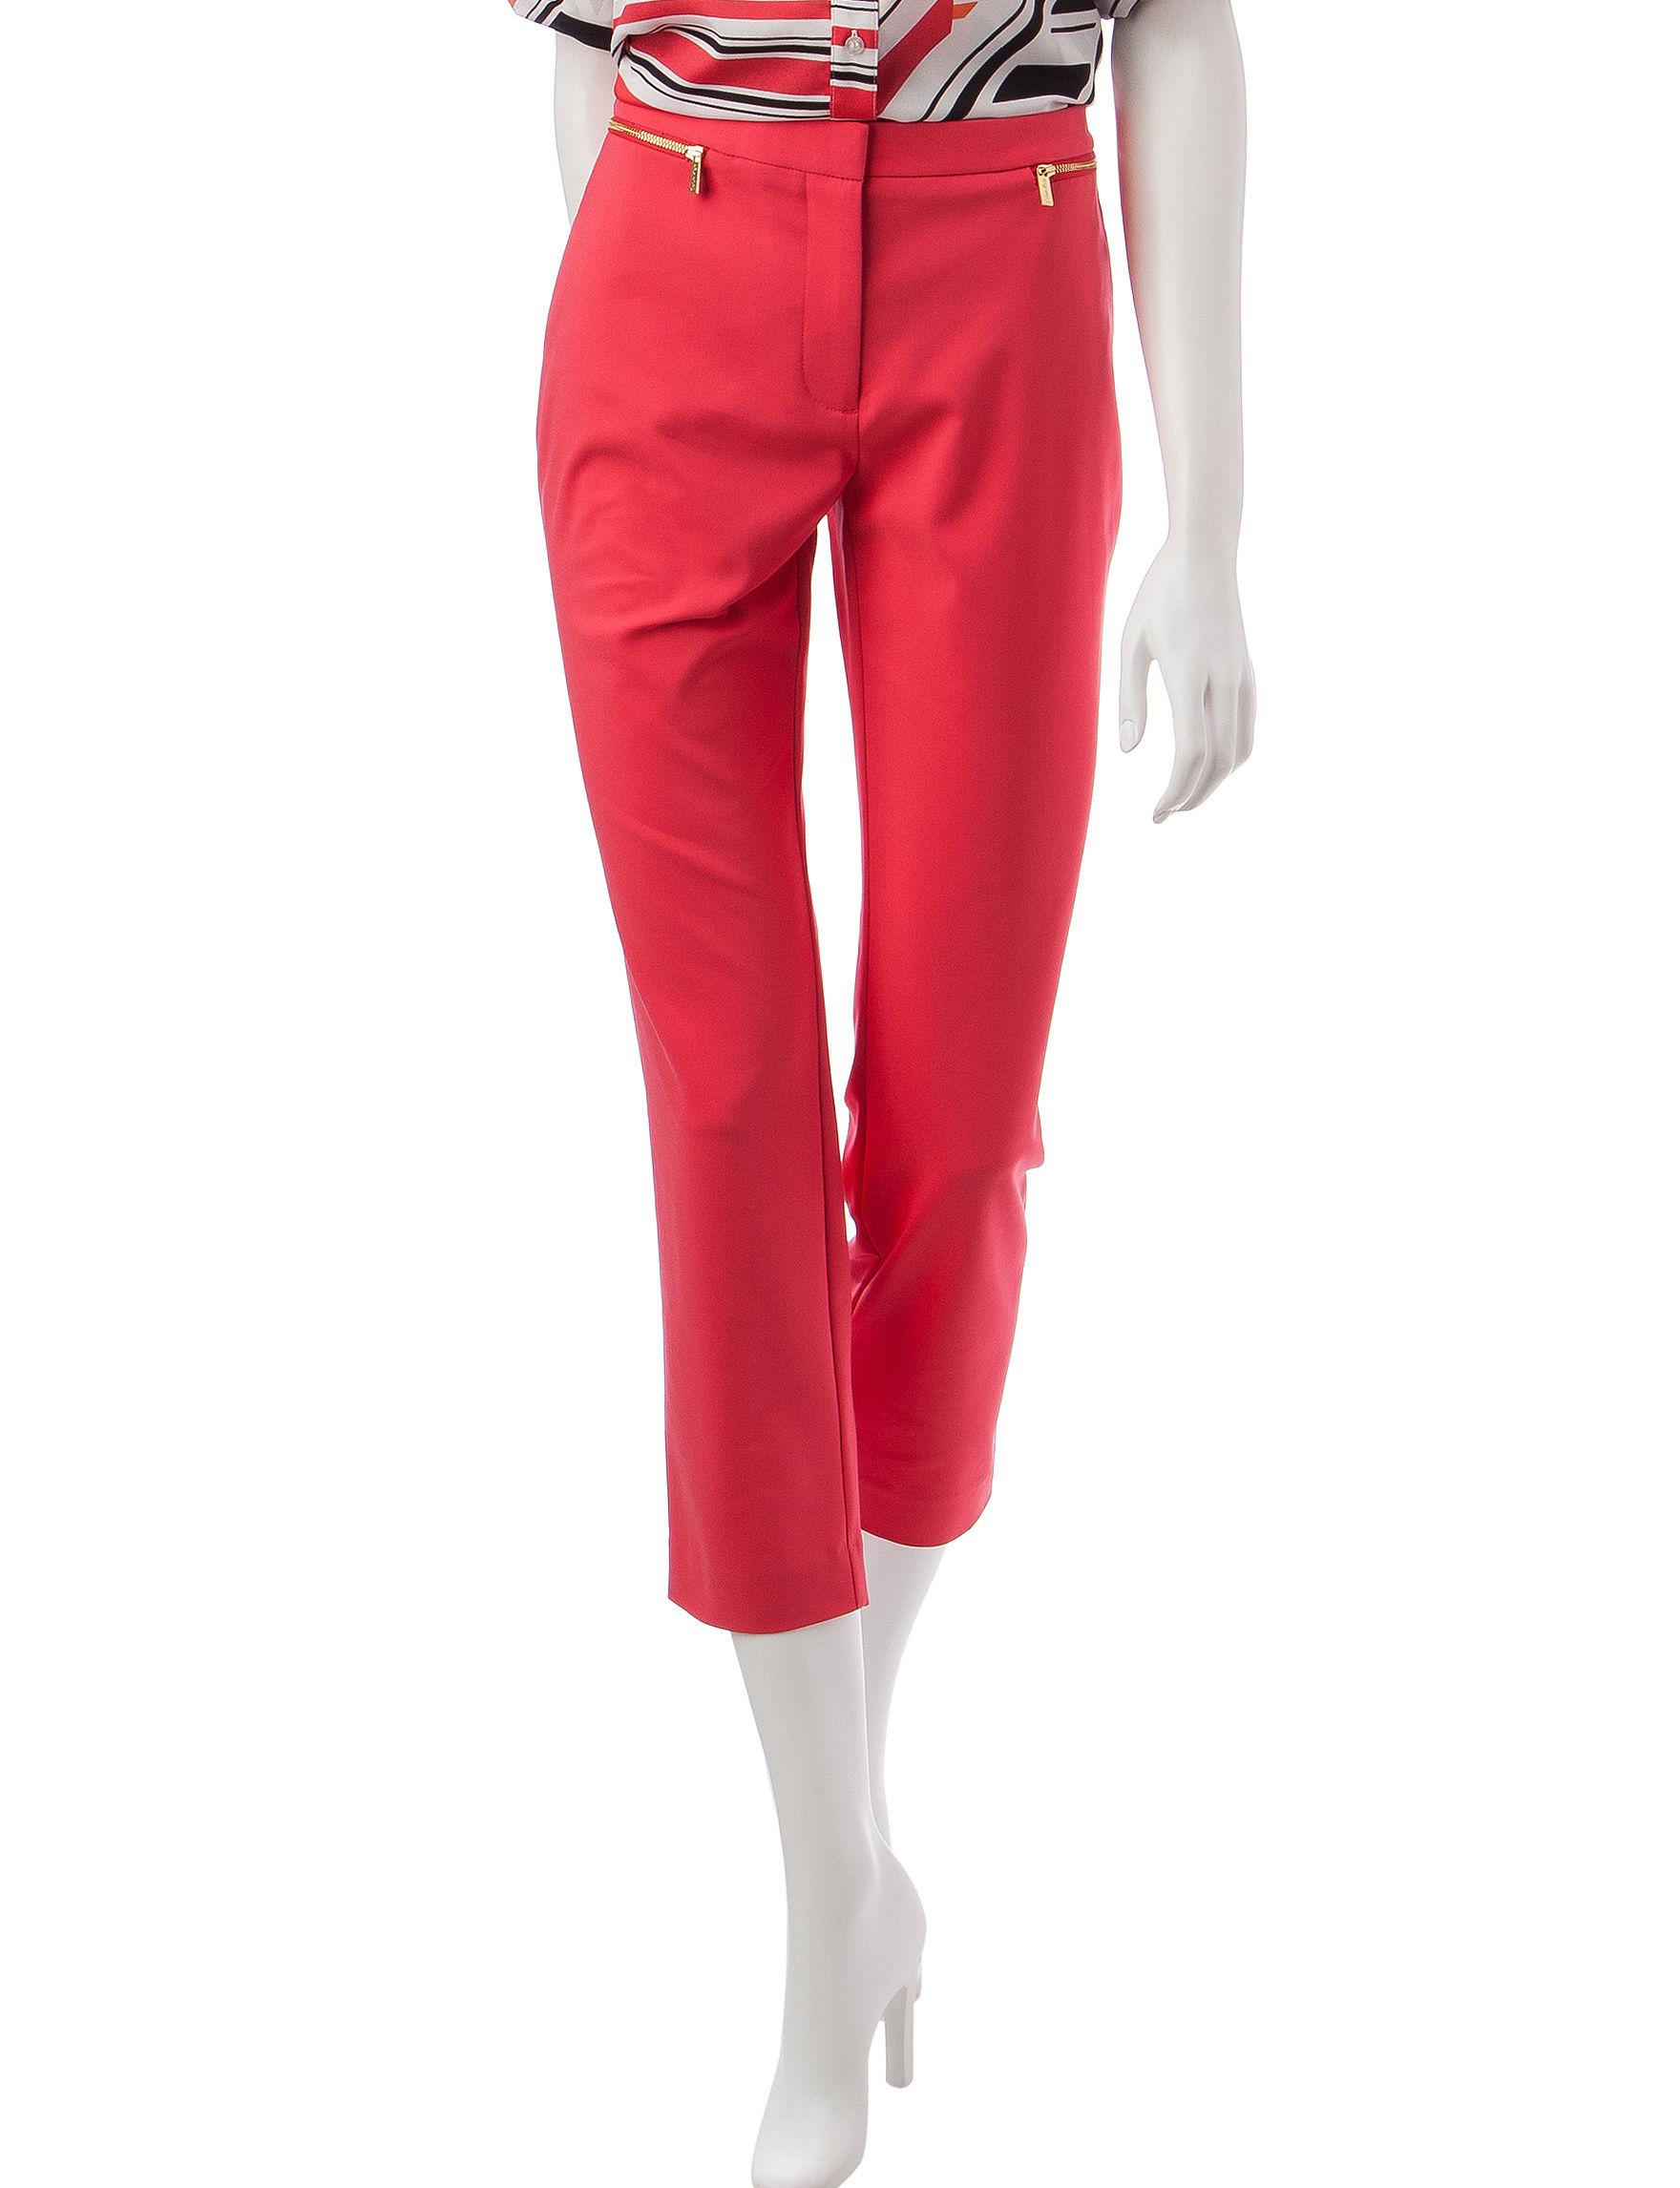 Calvin Klein Red Regular Soft Pants